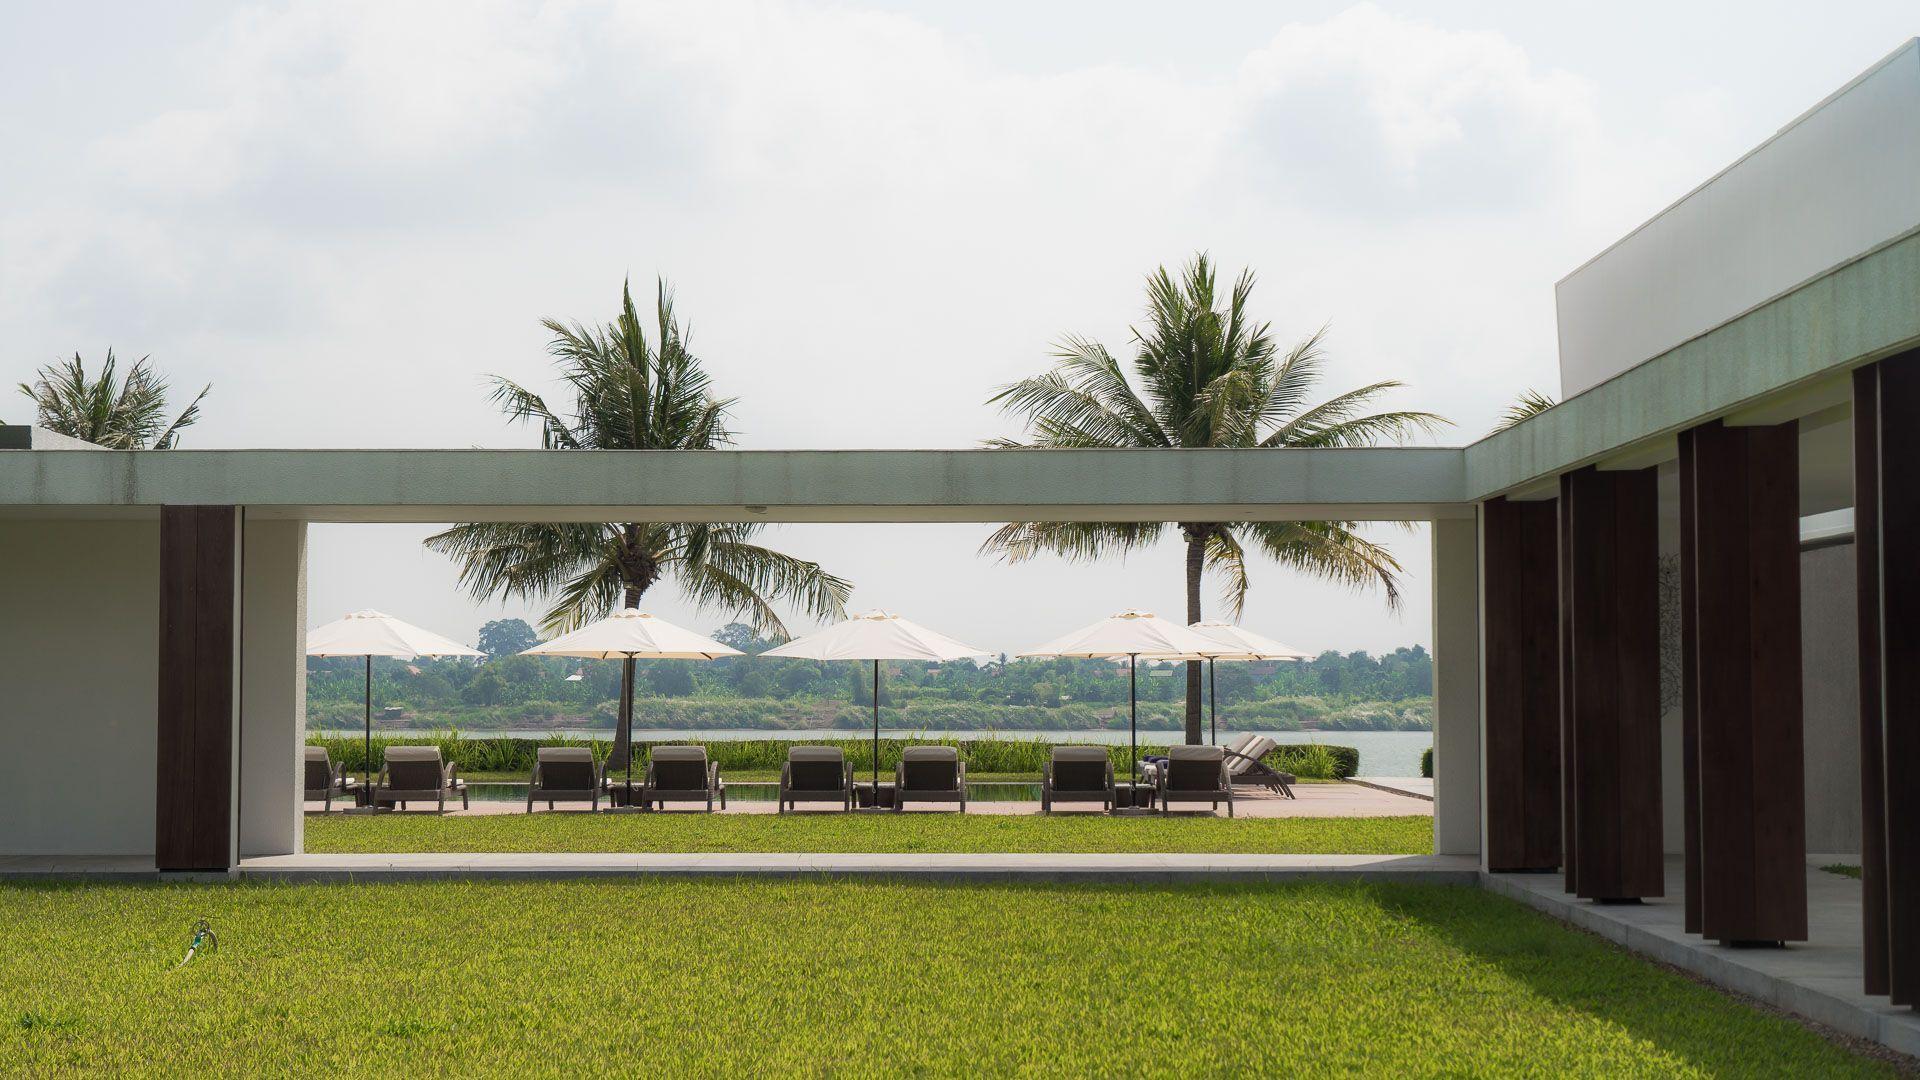 Lesvoyageuses-voyage-Phnom-Penh-cambodge-hotel-the-bale-experience-19